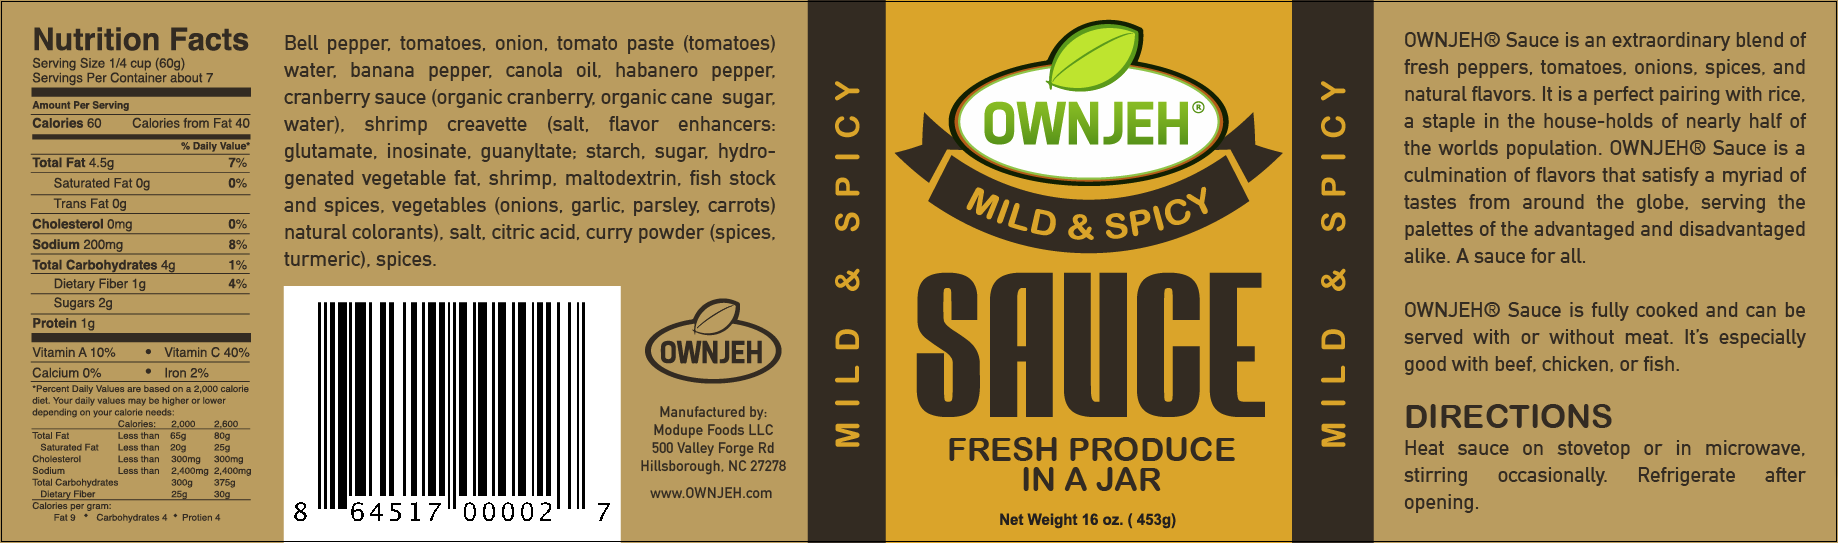 ownjeh-mild-spicy